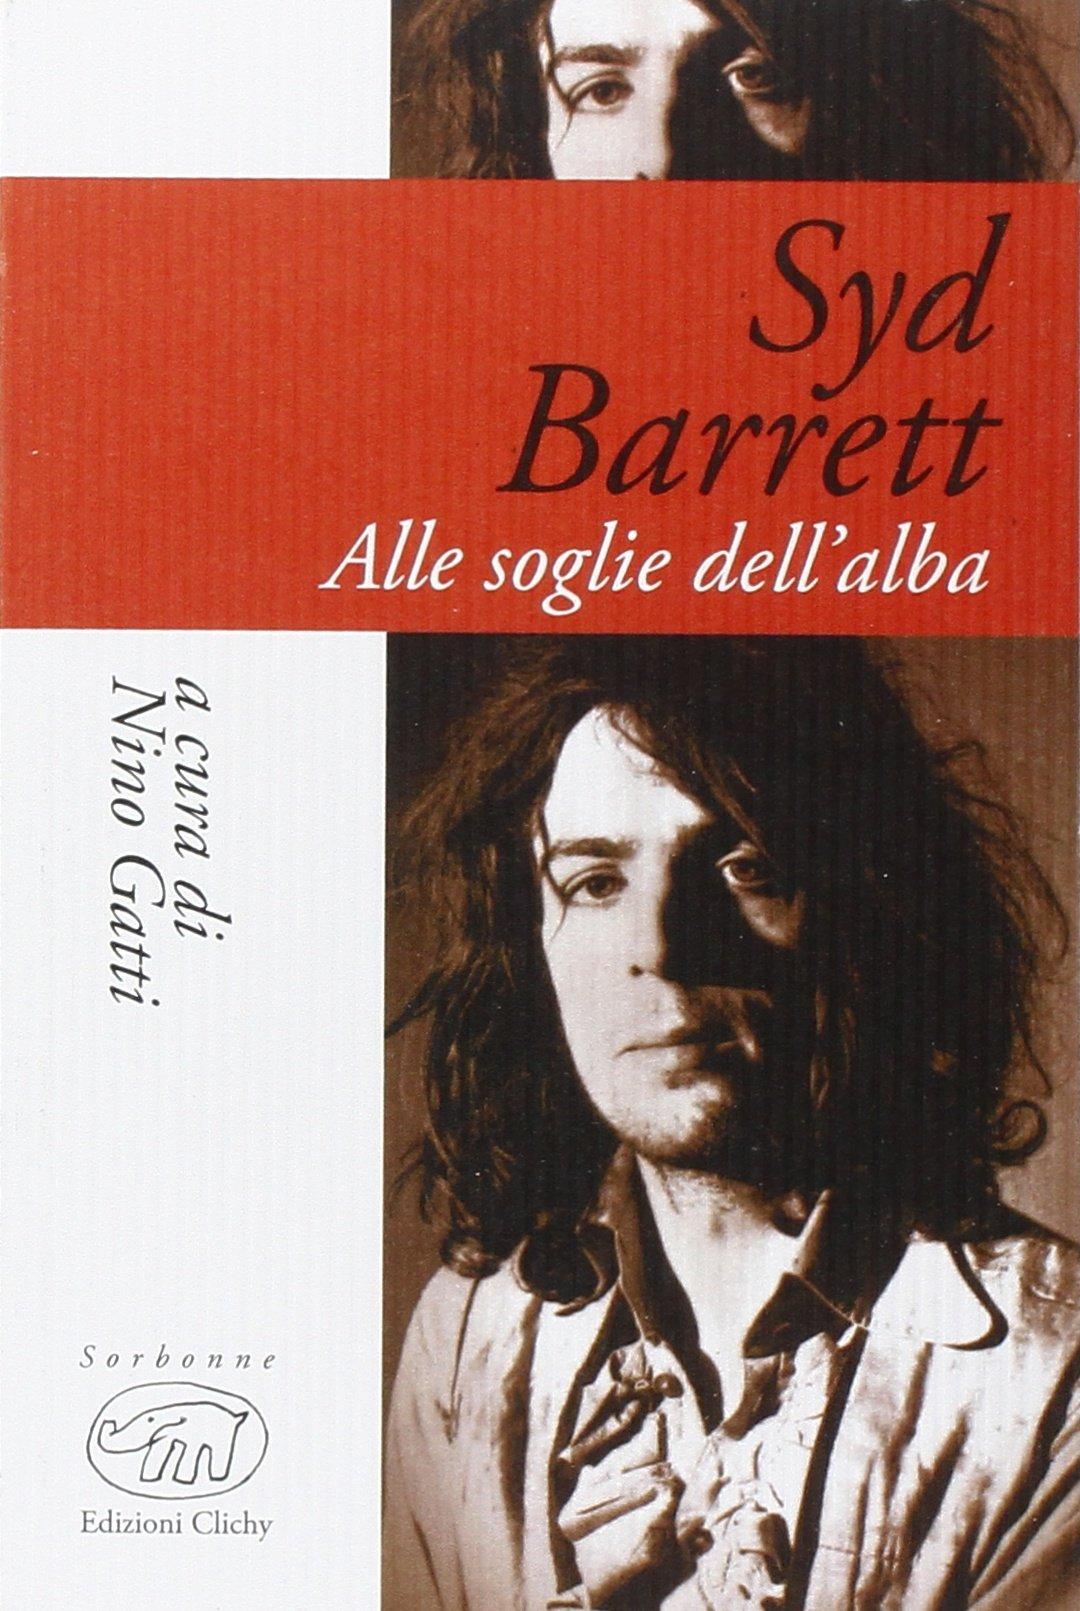 Syd Barrett Alle soglie dell'alba_2